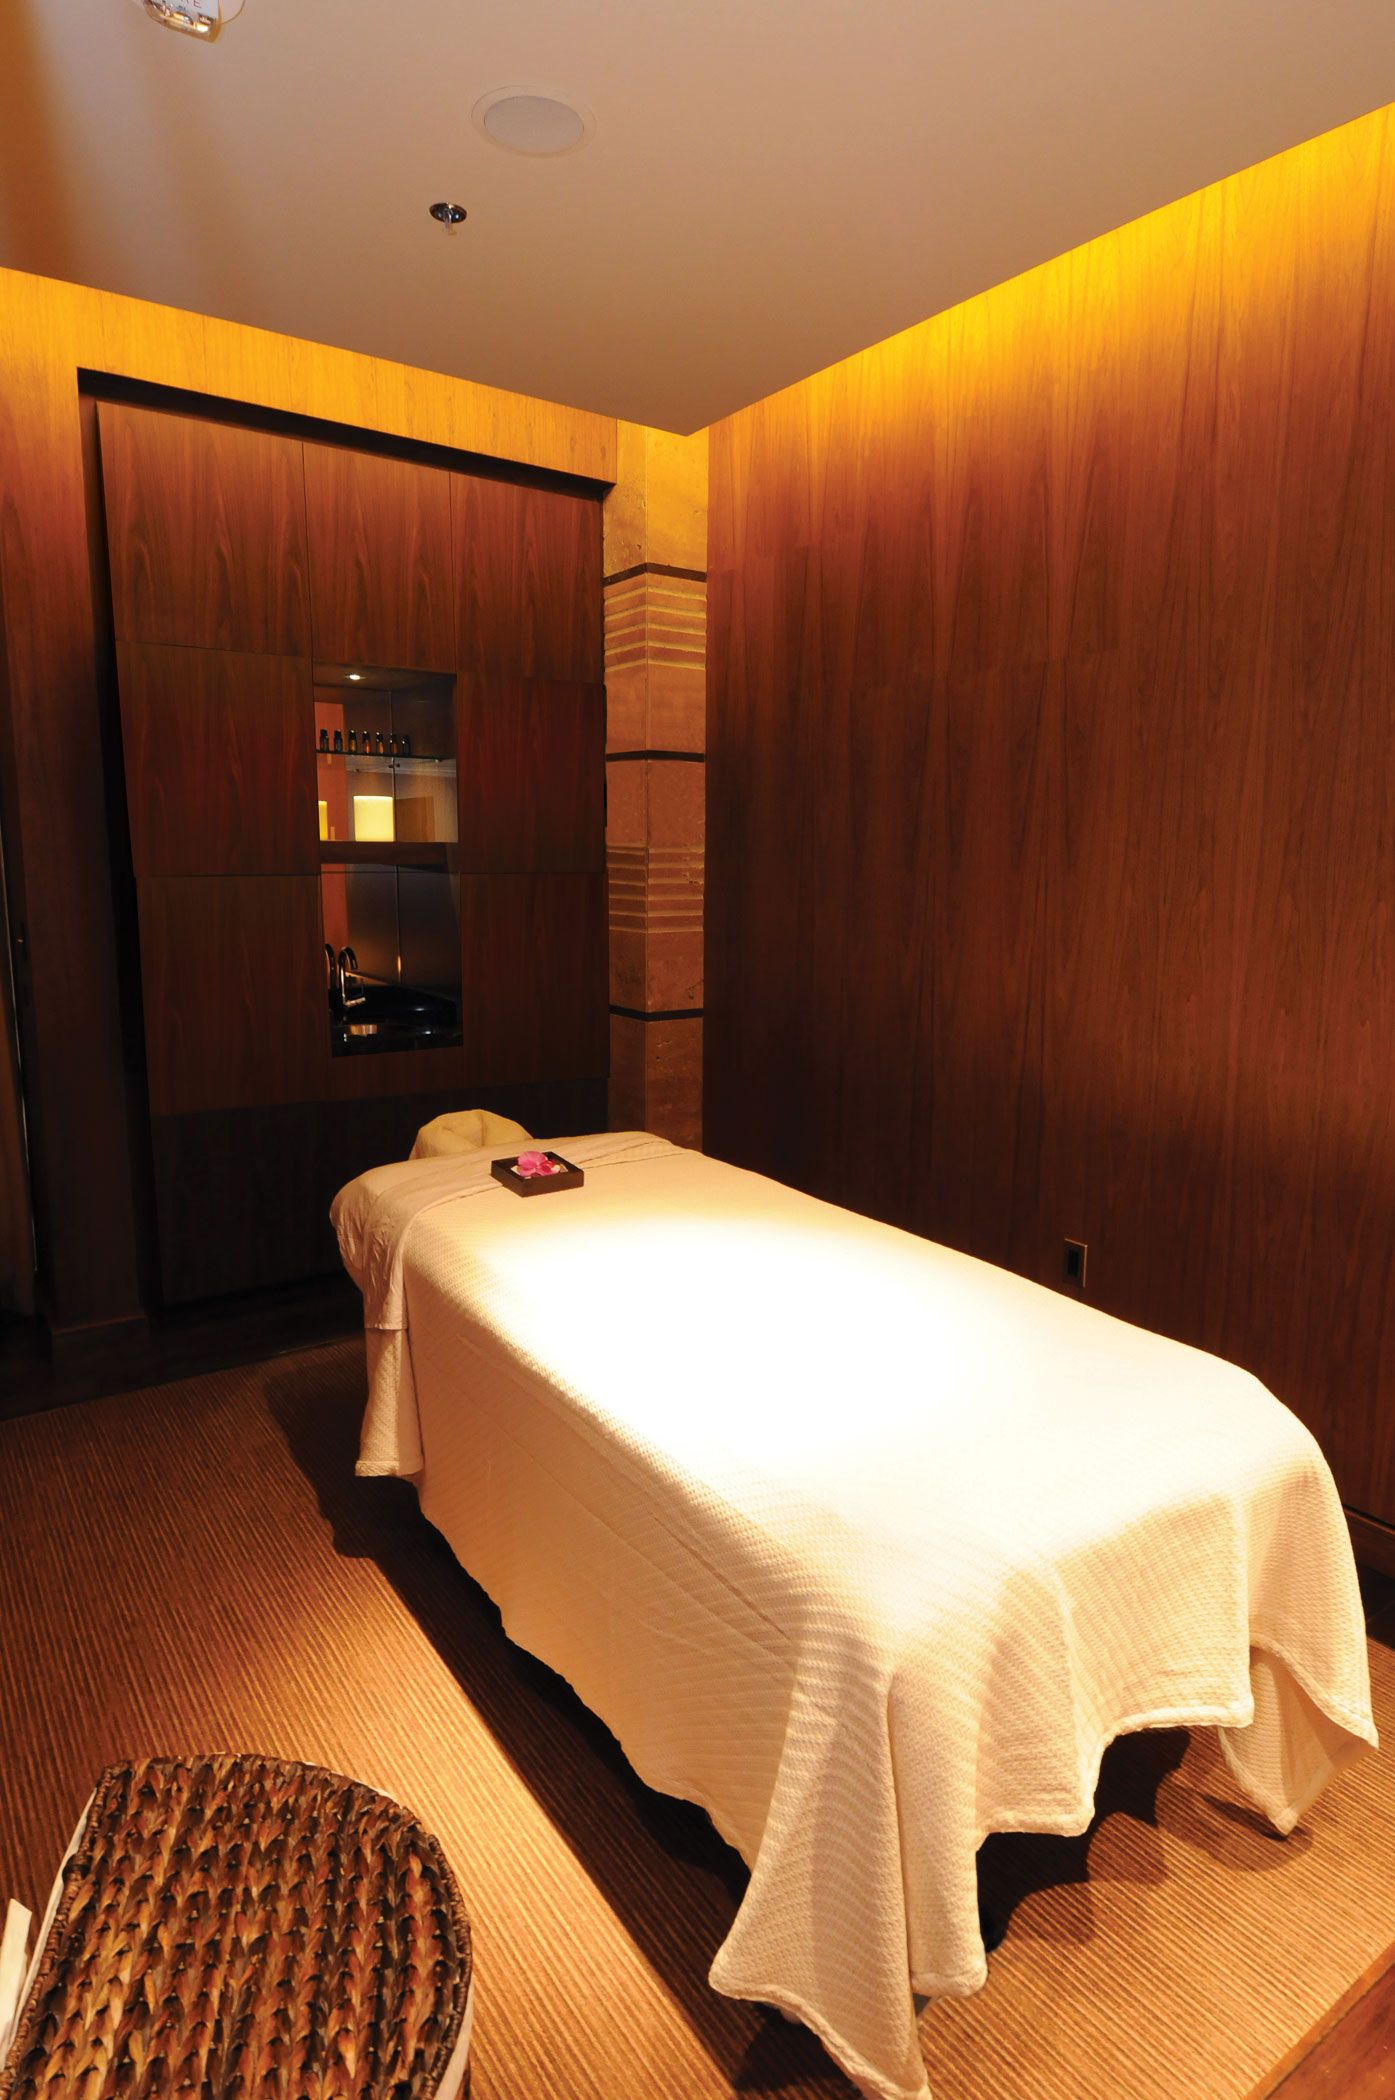 Themresort Com Media Gallery Images SPA Spa Mio Massage